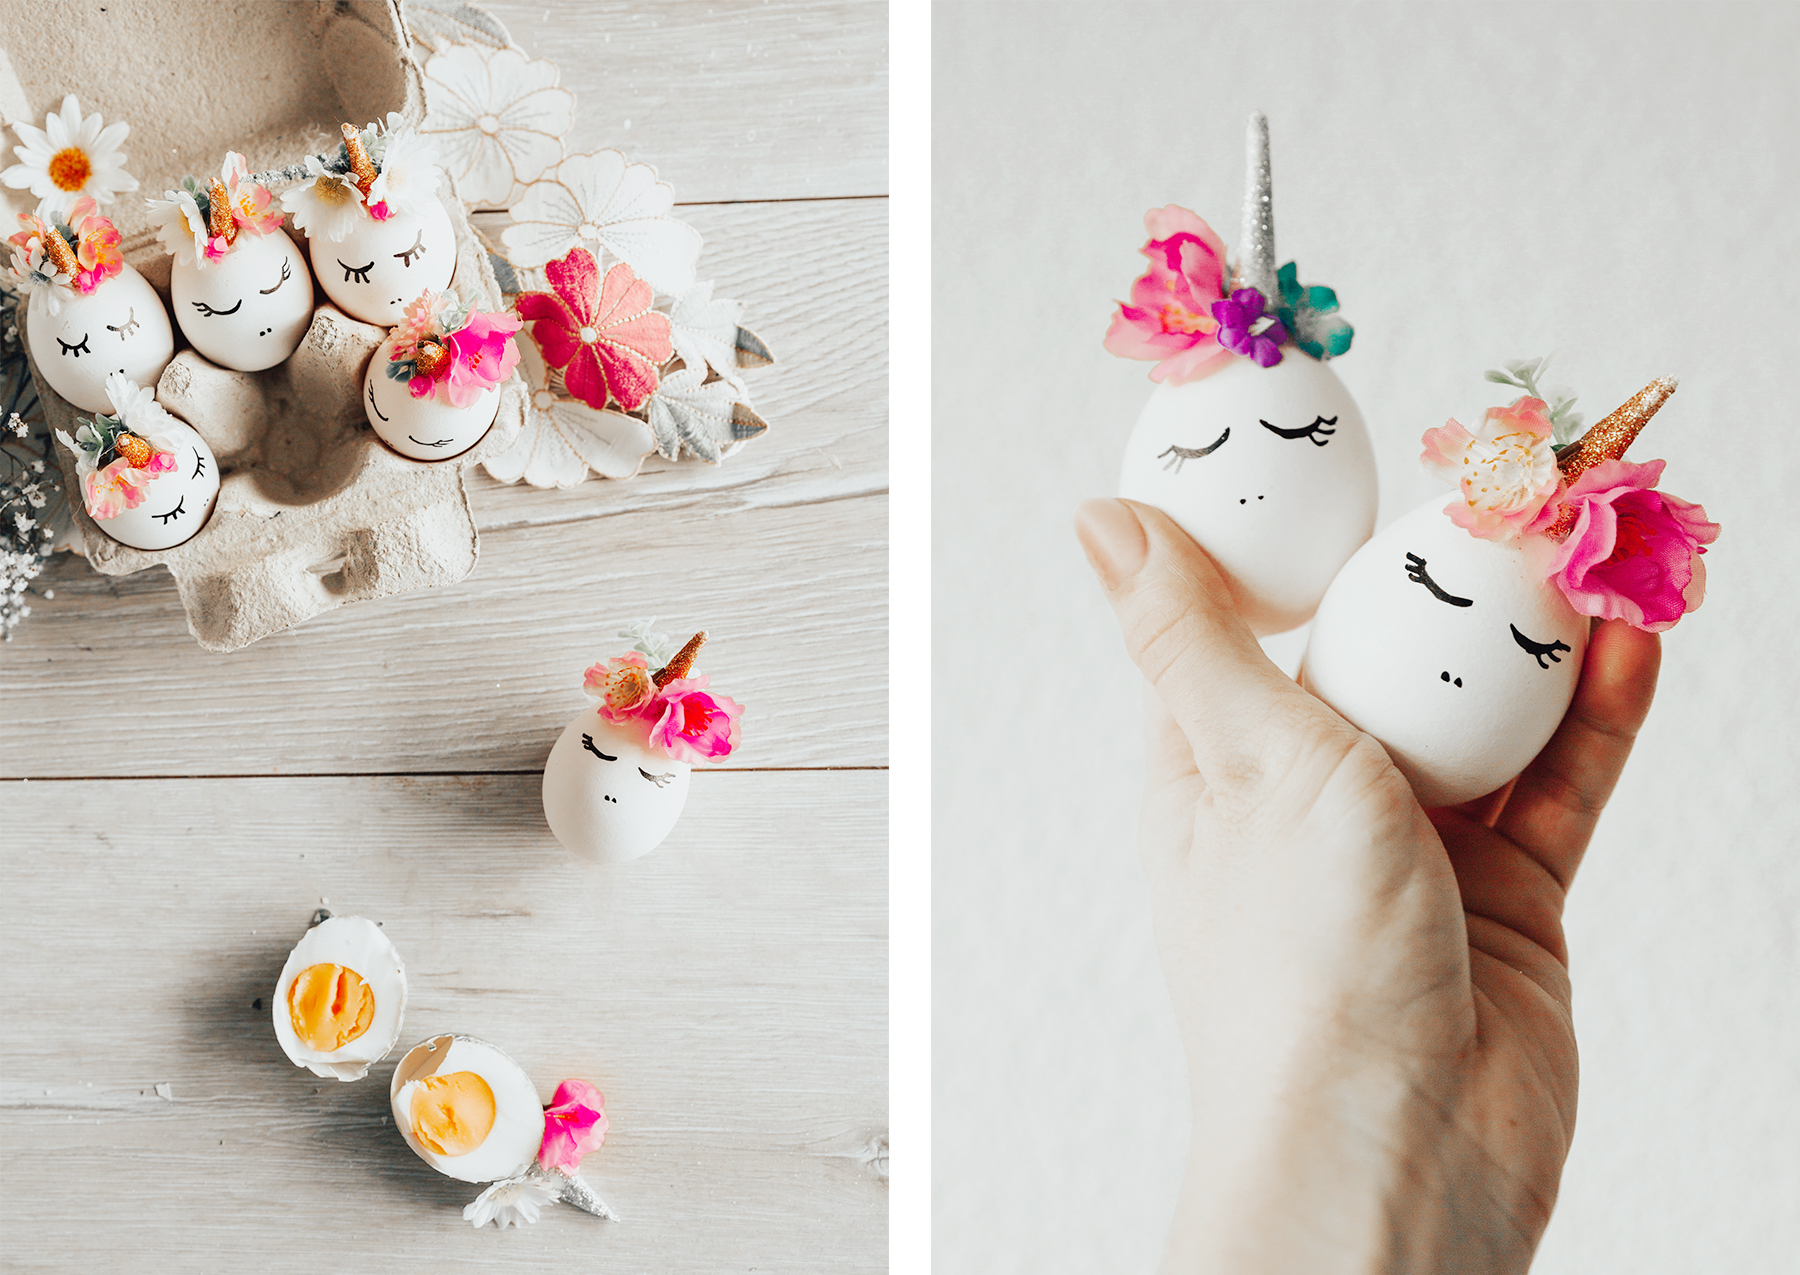 Einhorn Ostereier bemalen - Ostereier verzieren mit Blumen